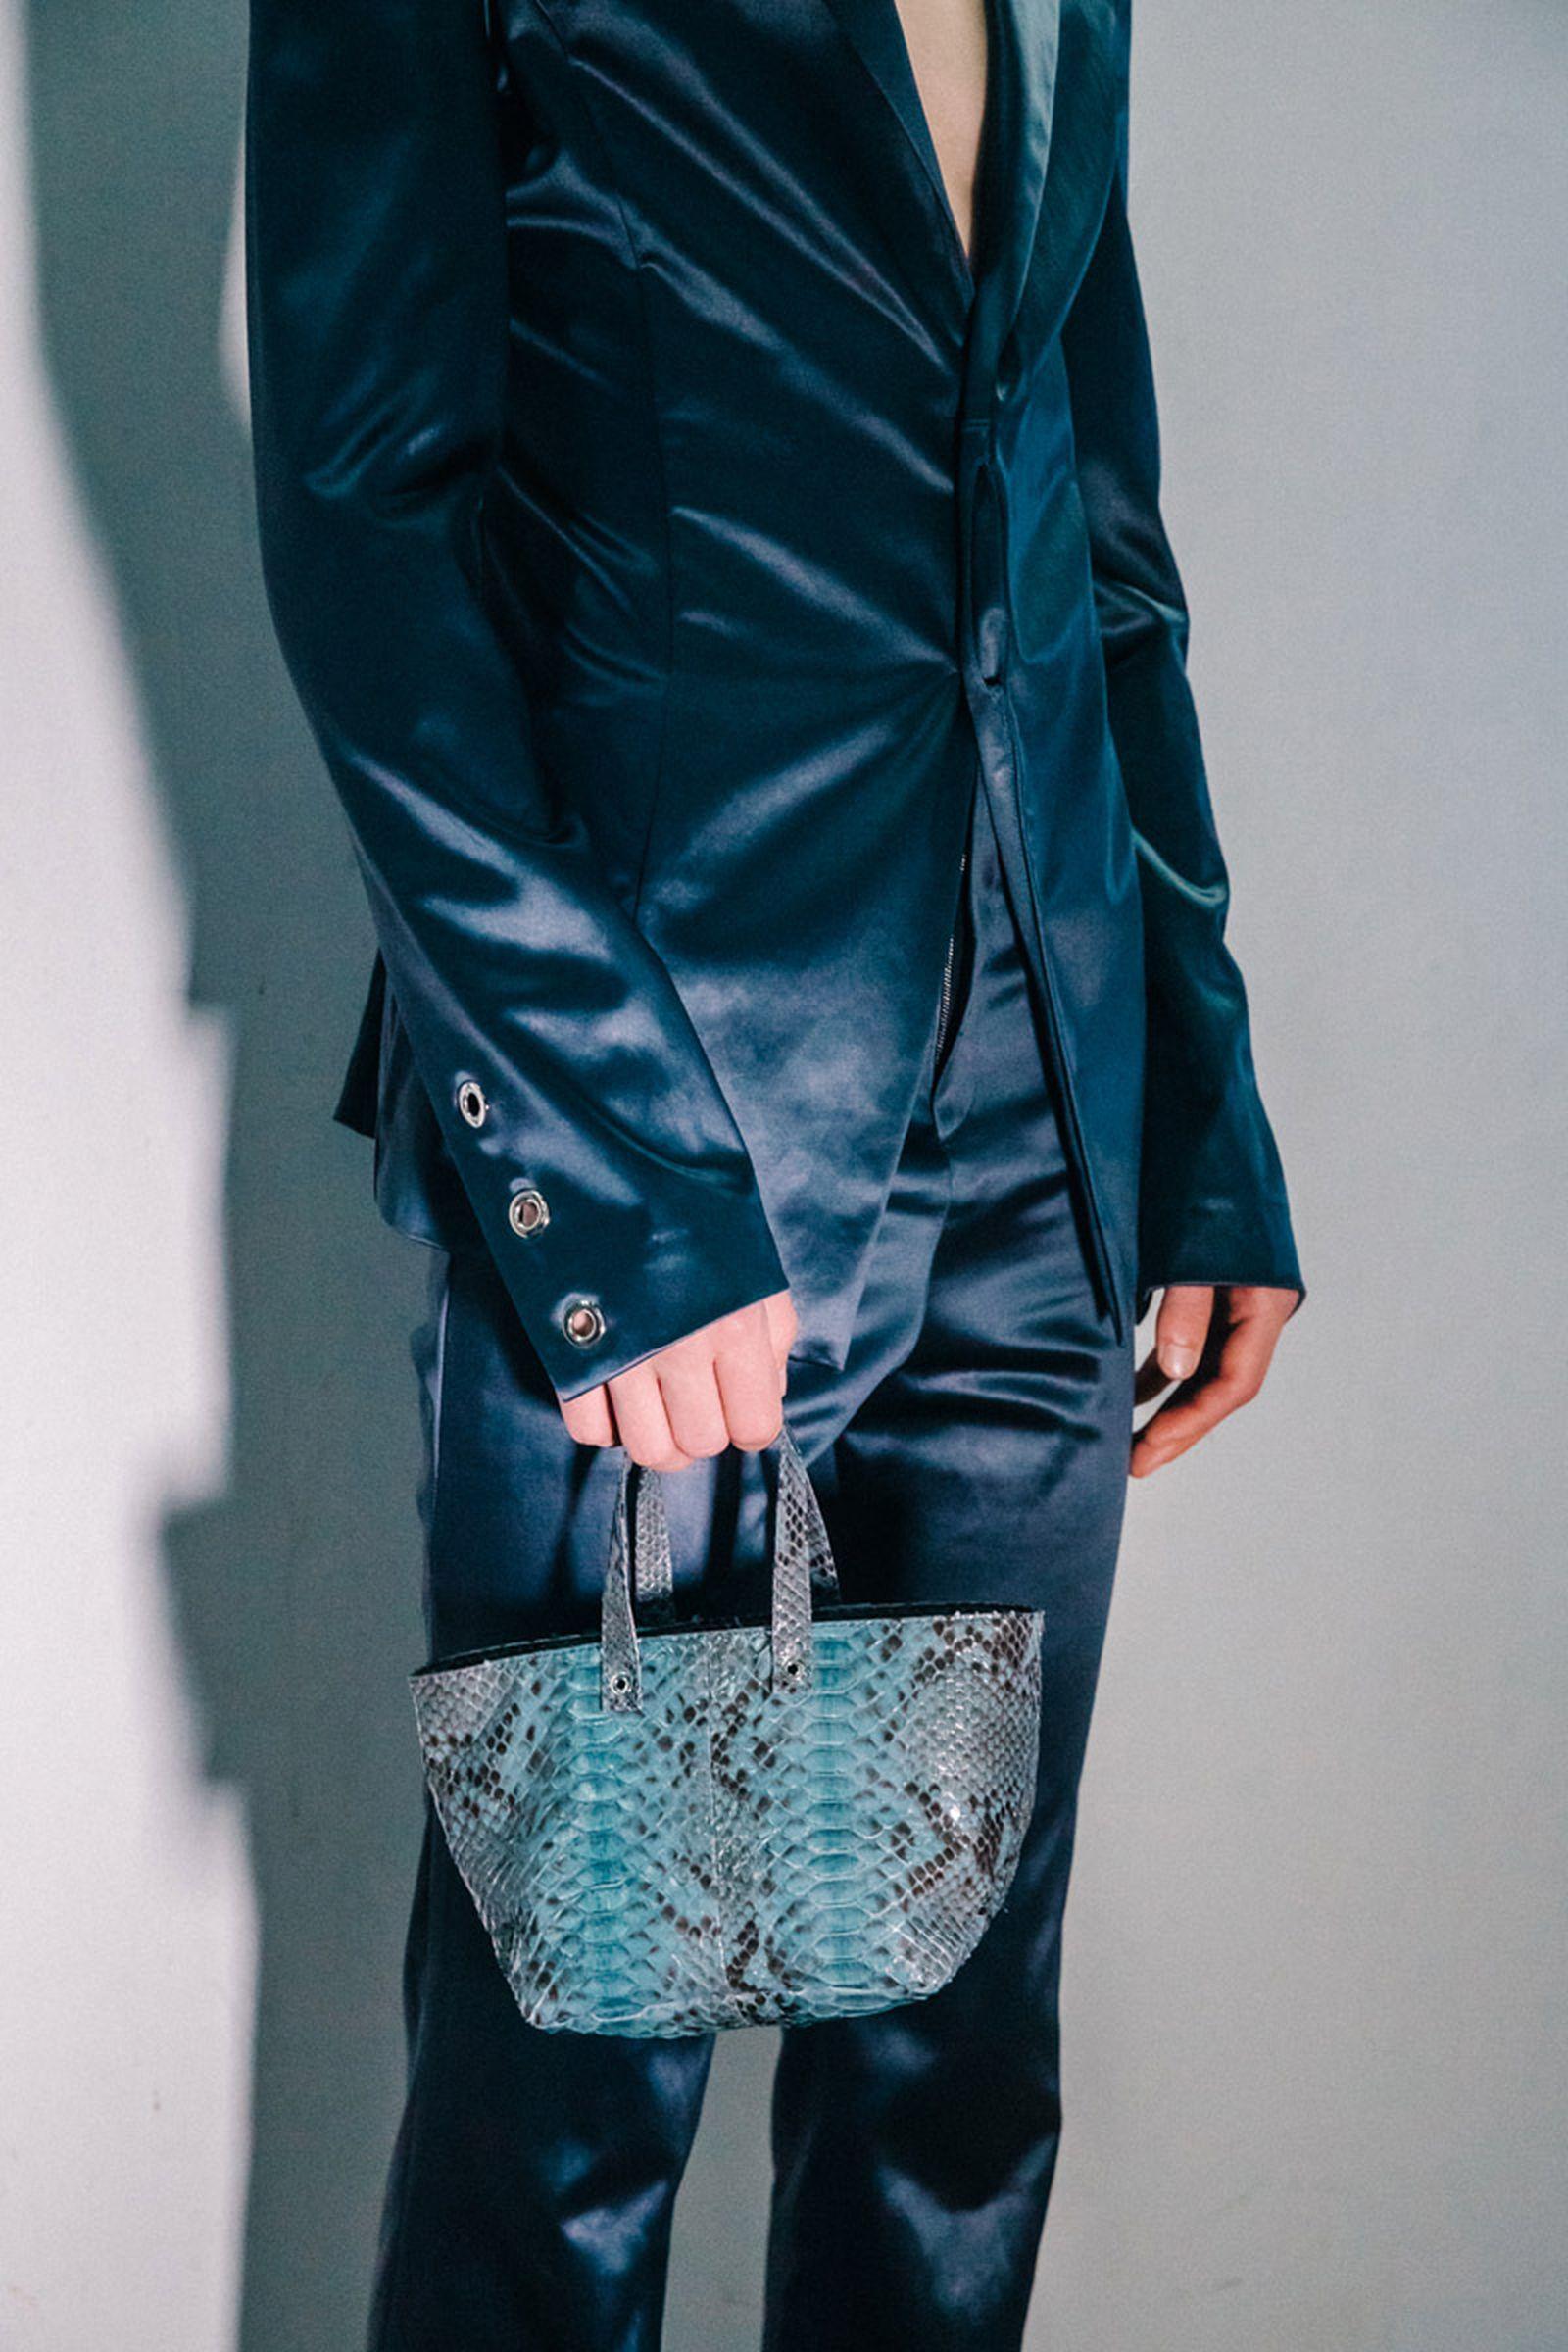 MSS20 Paris Ludovic de Saint Sernin Julien Tell For Web 04 paris fashion week runway